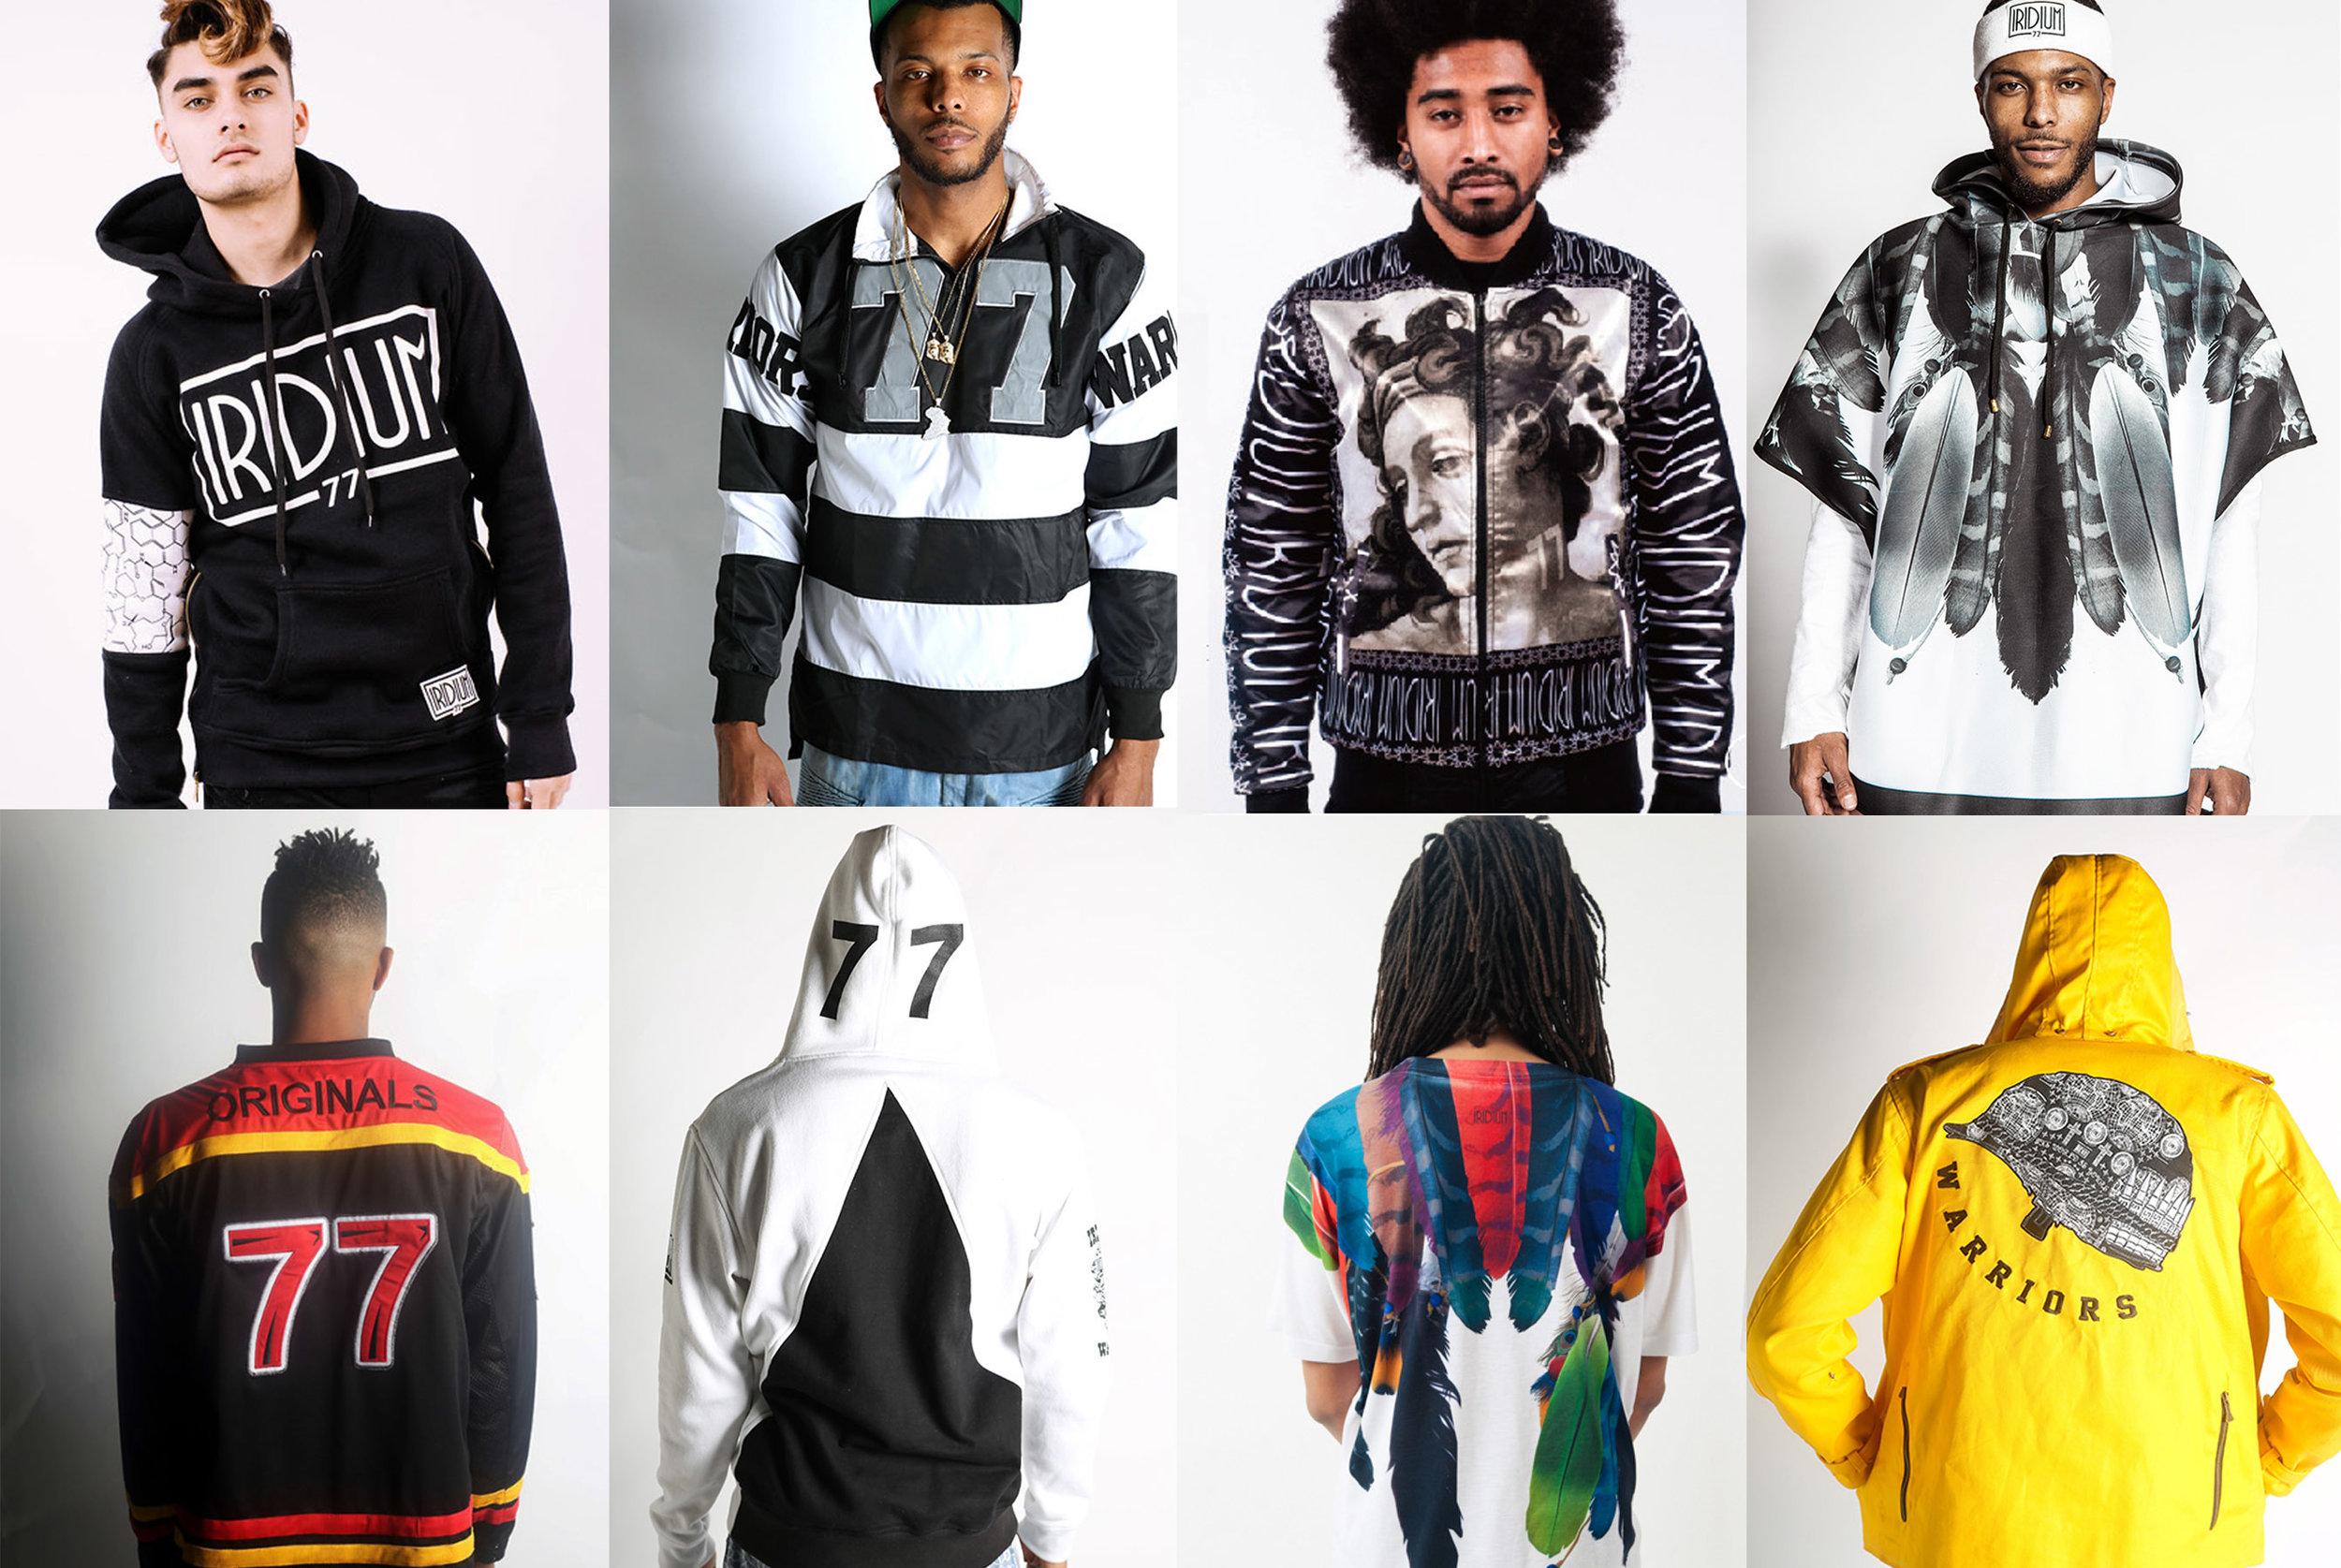 pugs clothing designs.jpg